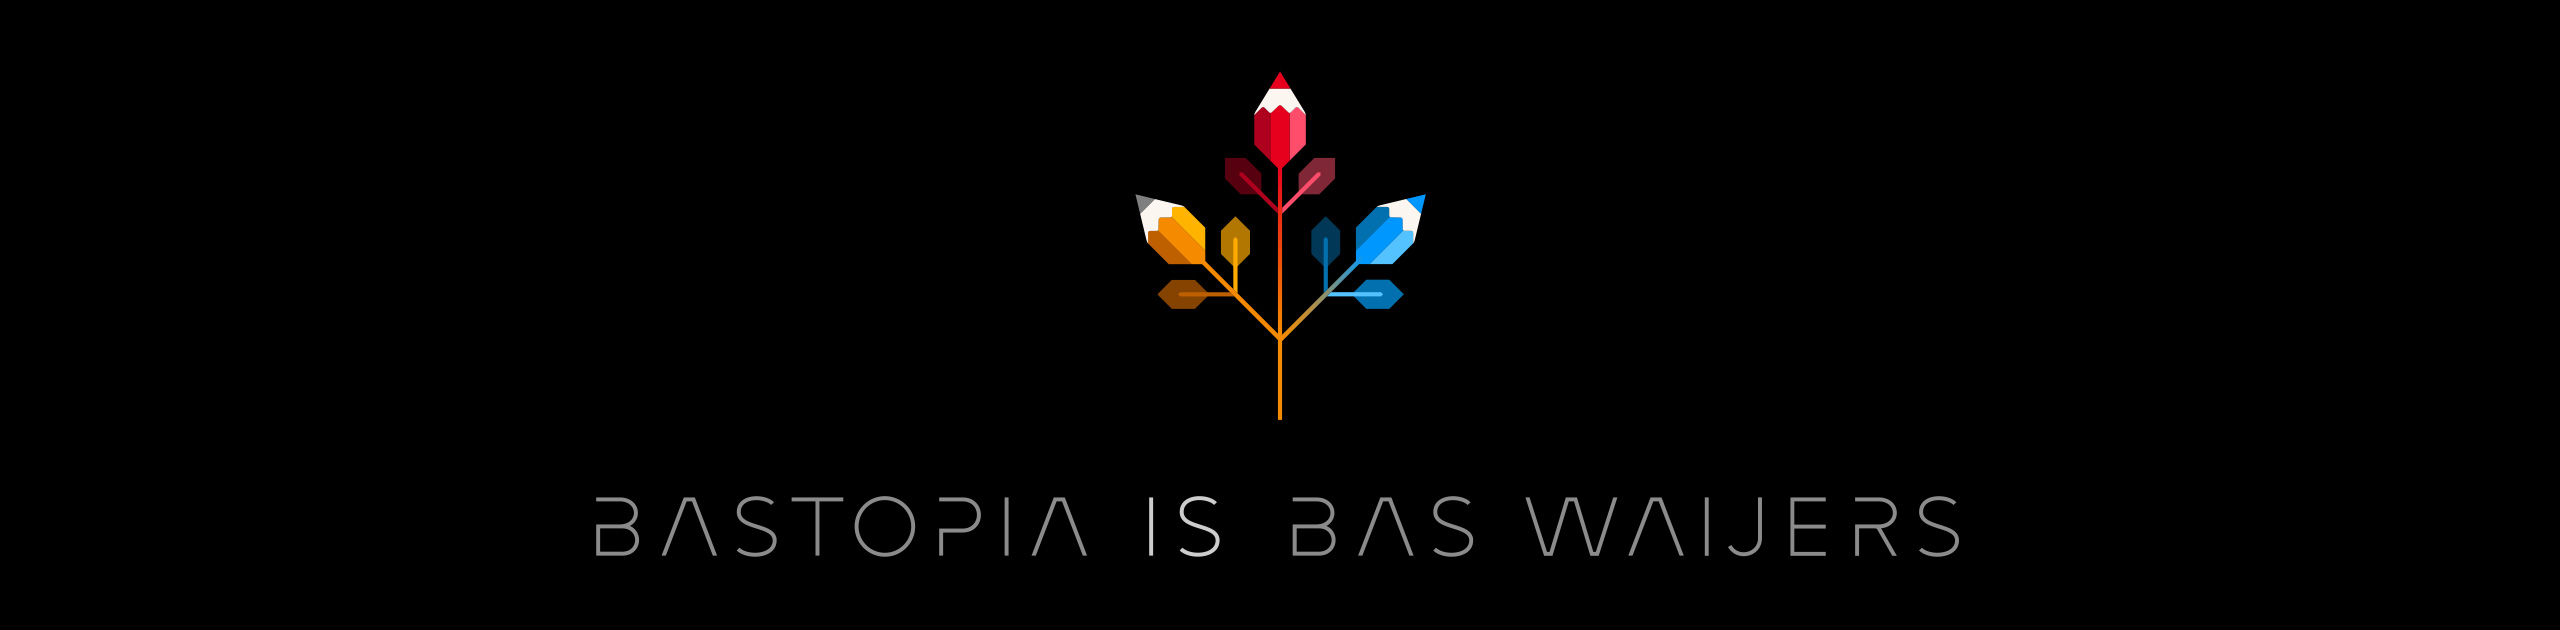 7-Bastopia-is-BasWaijers